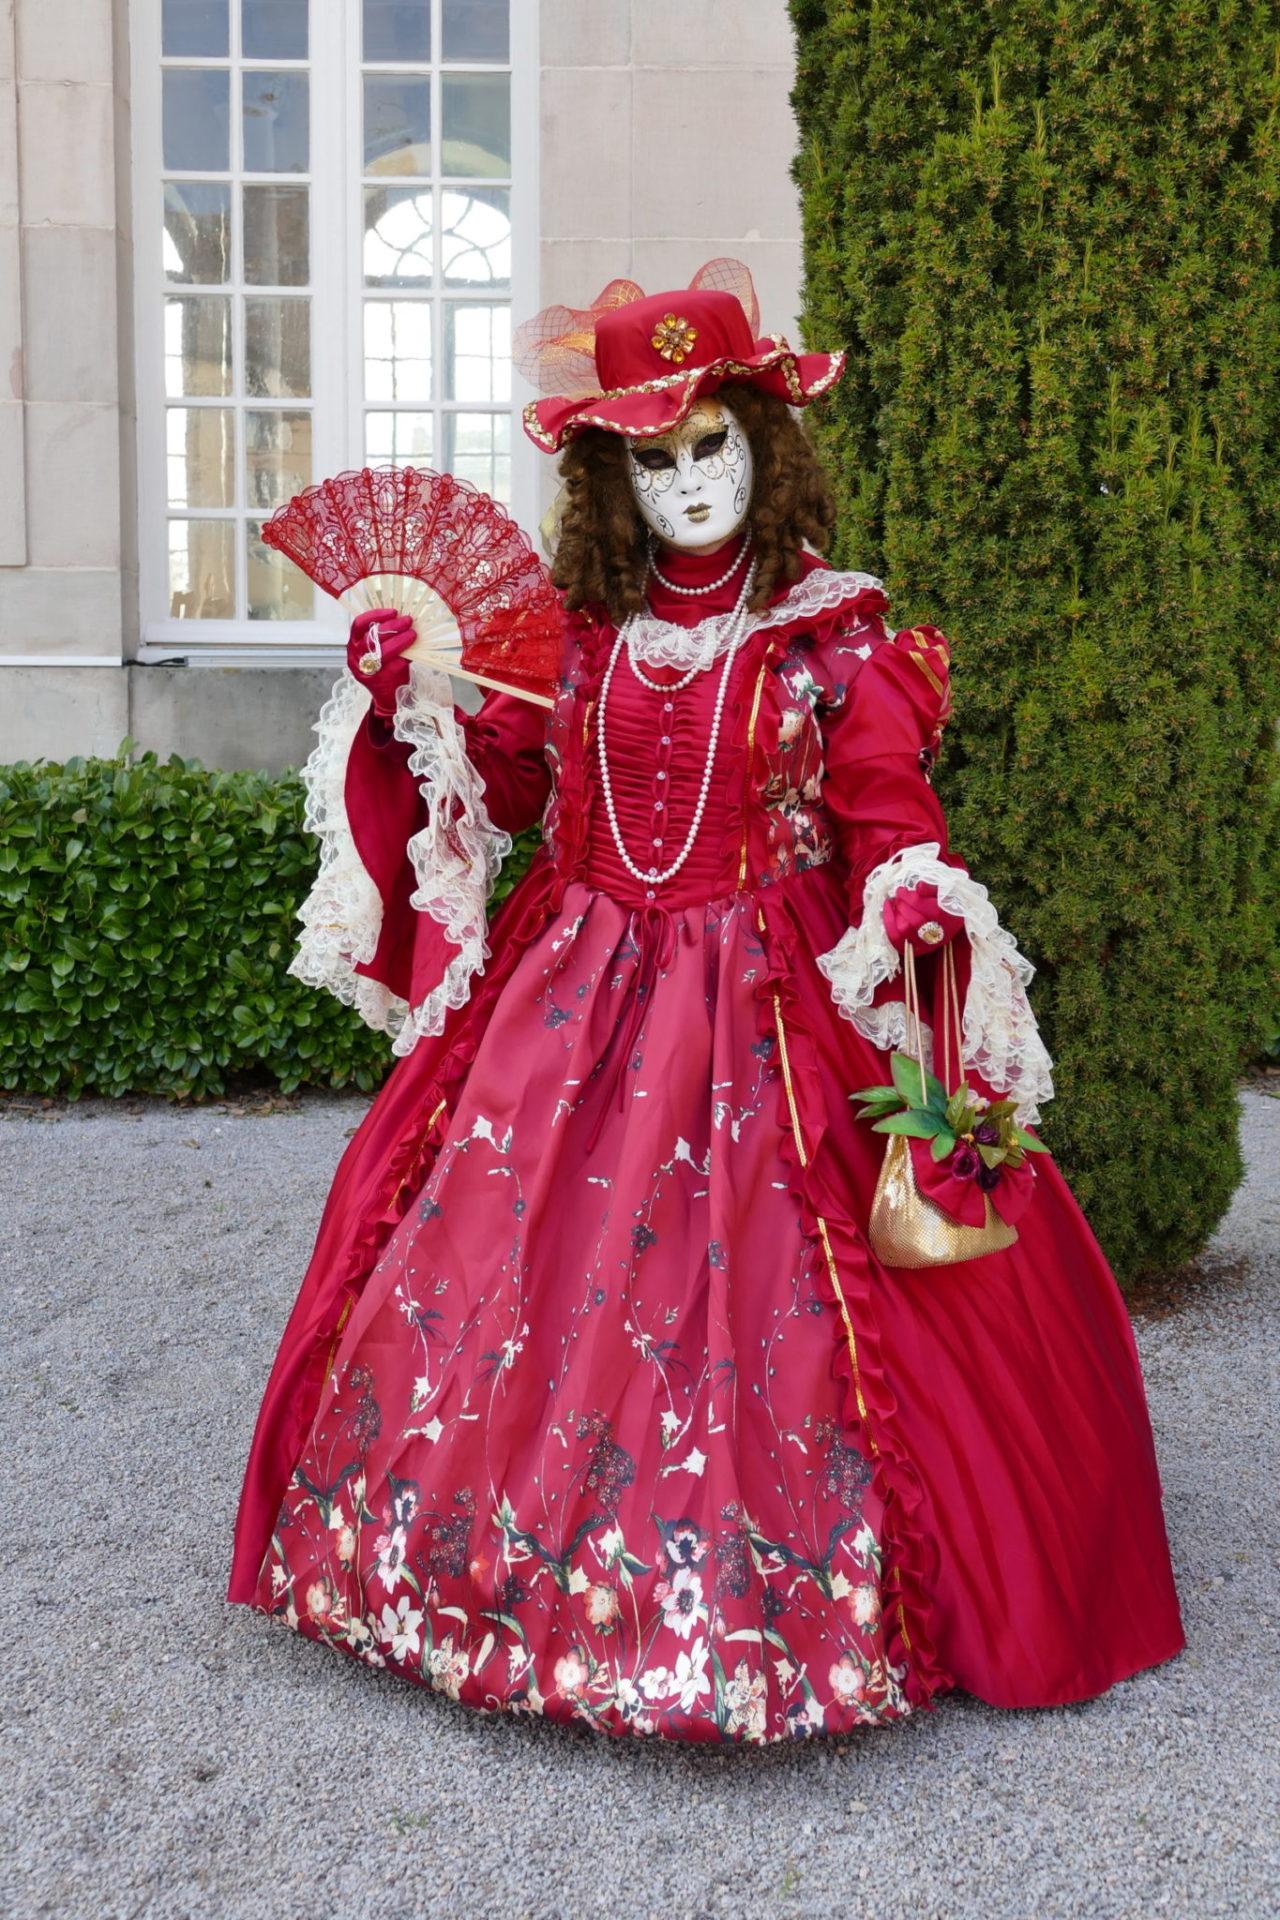 La Dame en rouge - Photo Ingrid et Arno Martini